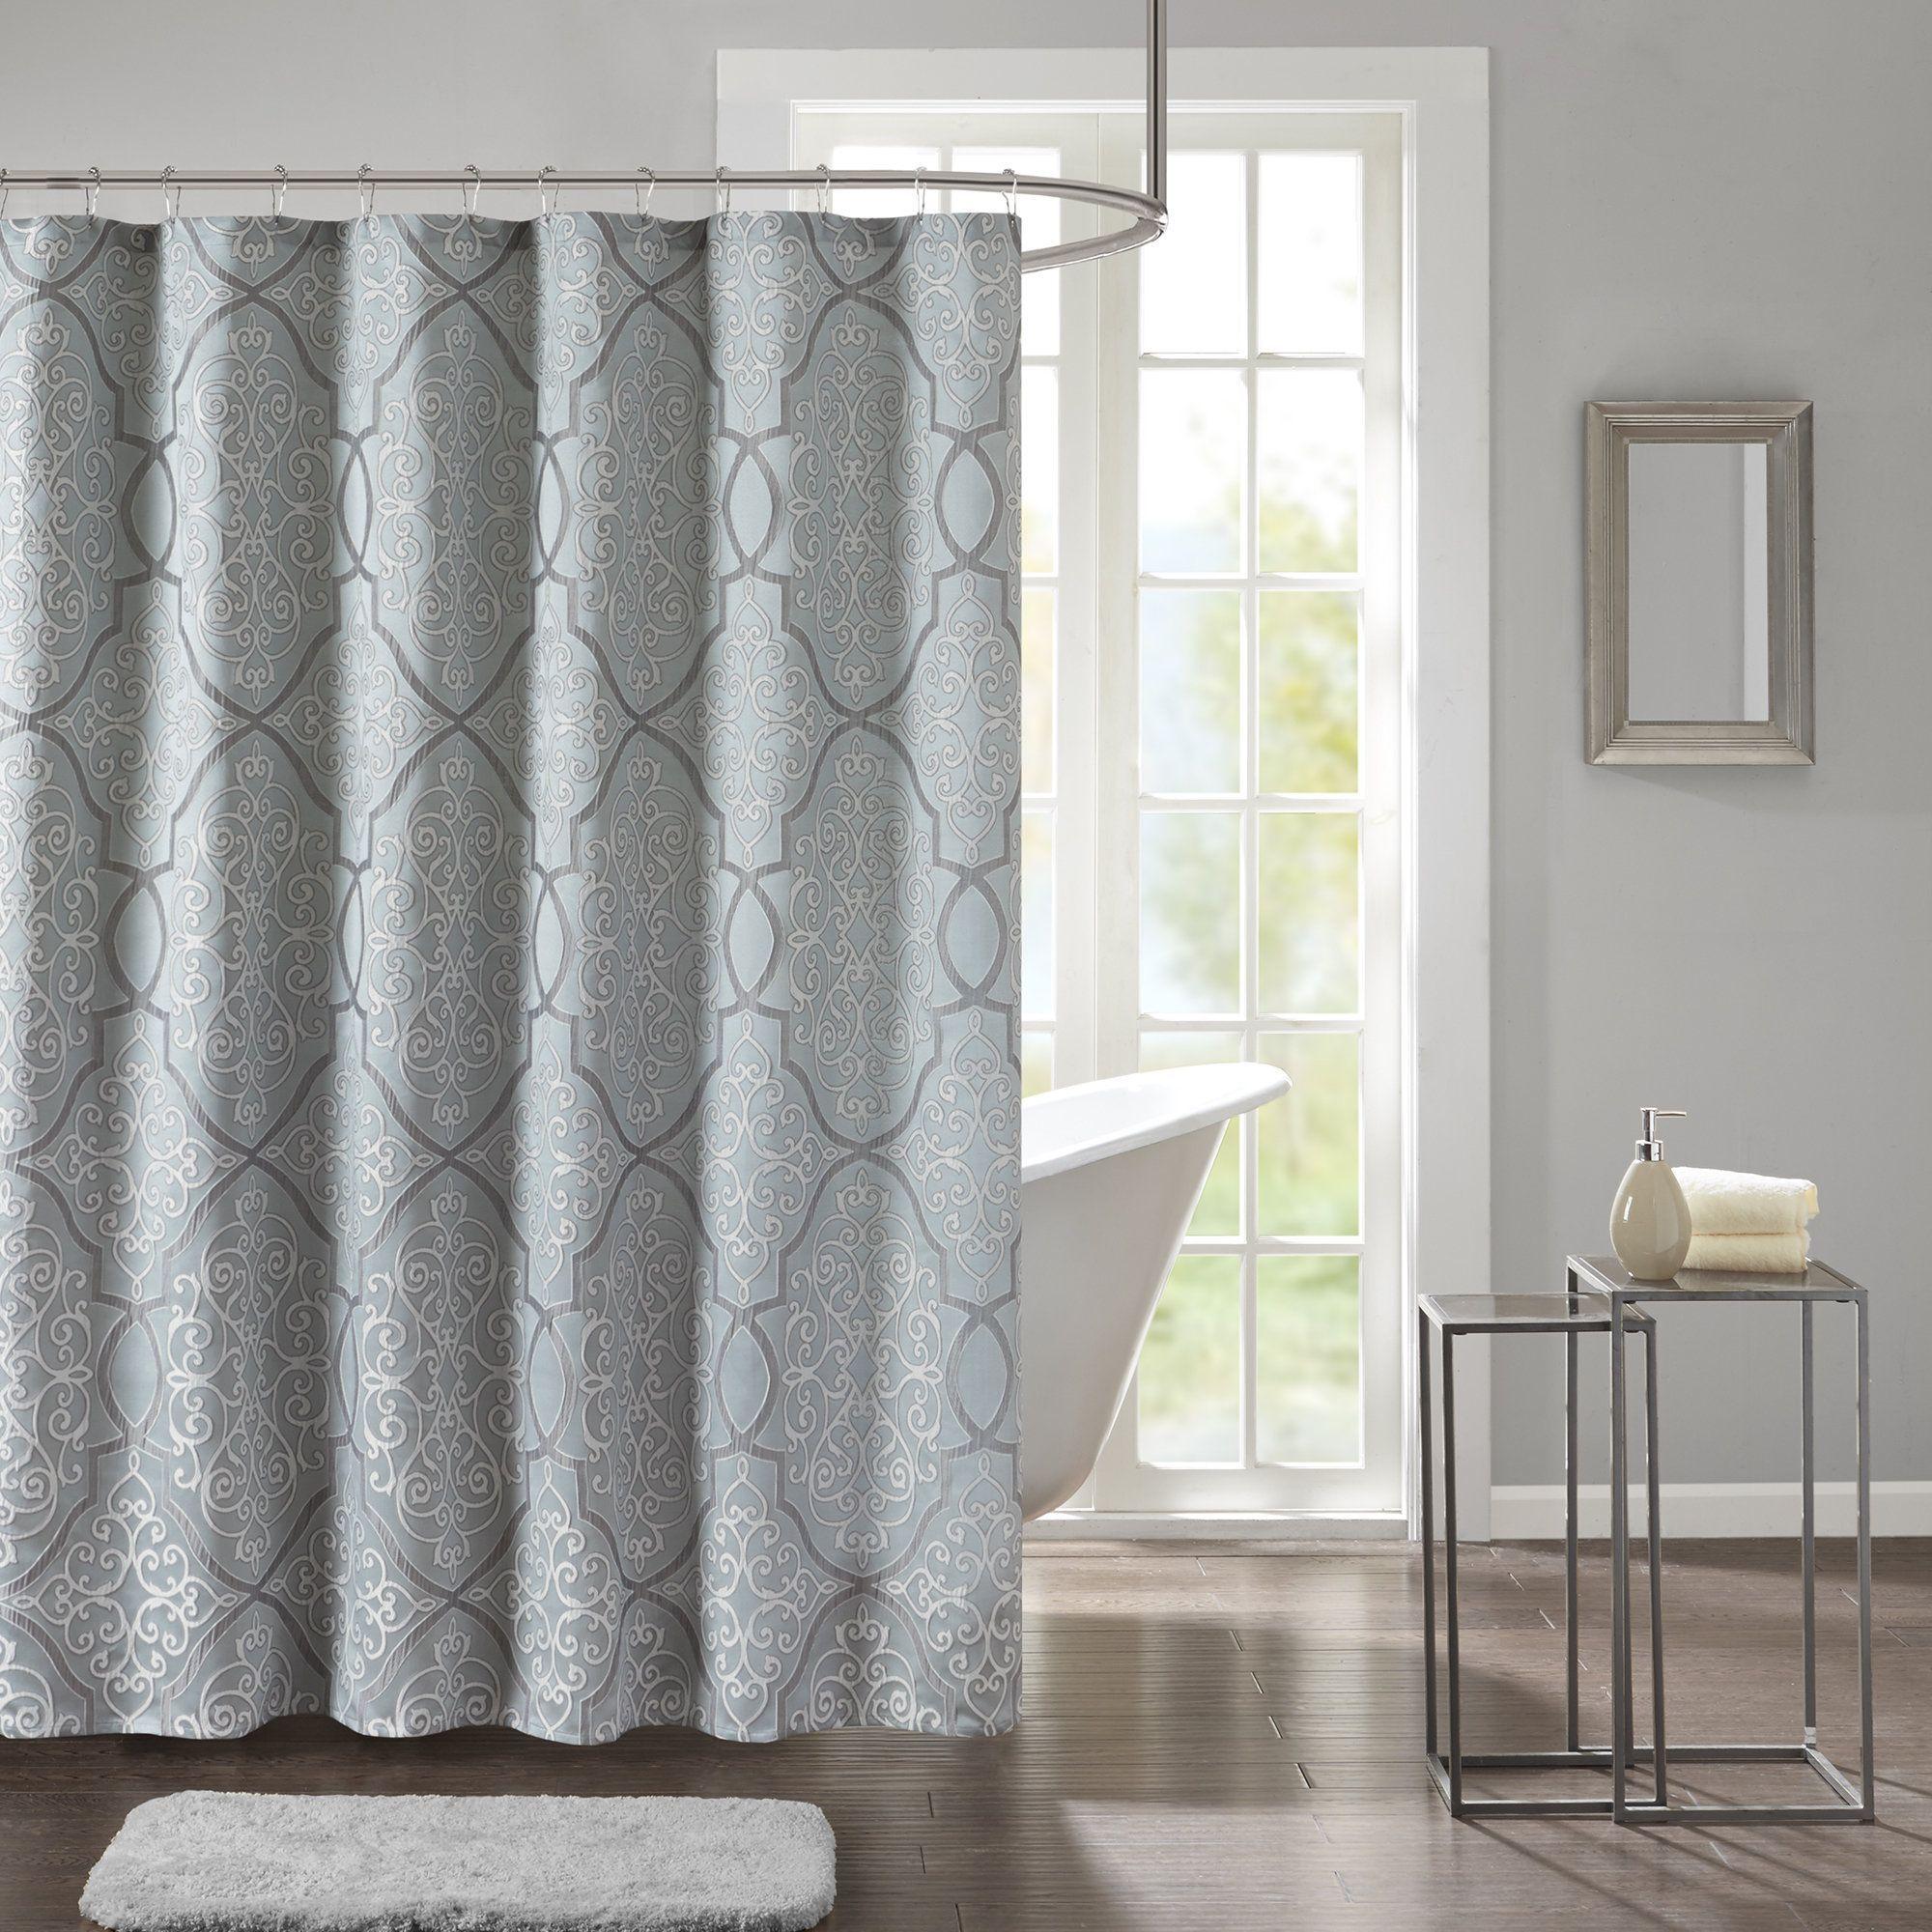 Madison Park Anouk Jacquard Shower Curtain 72x72 Blue Blue